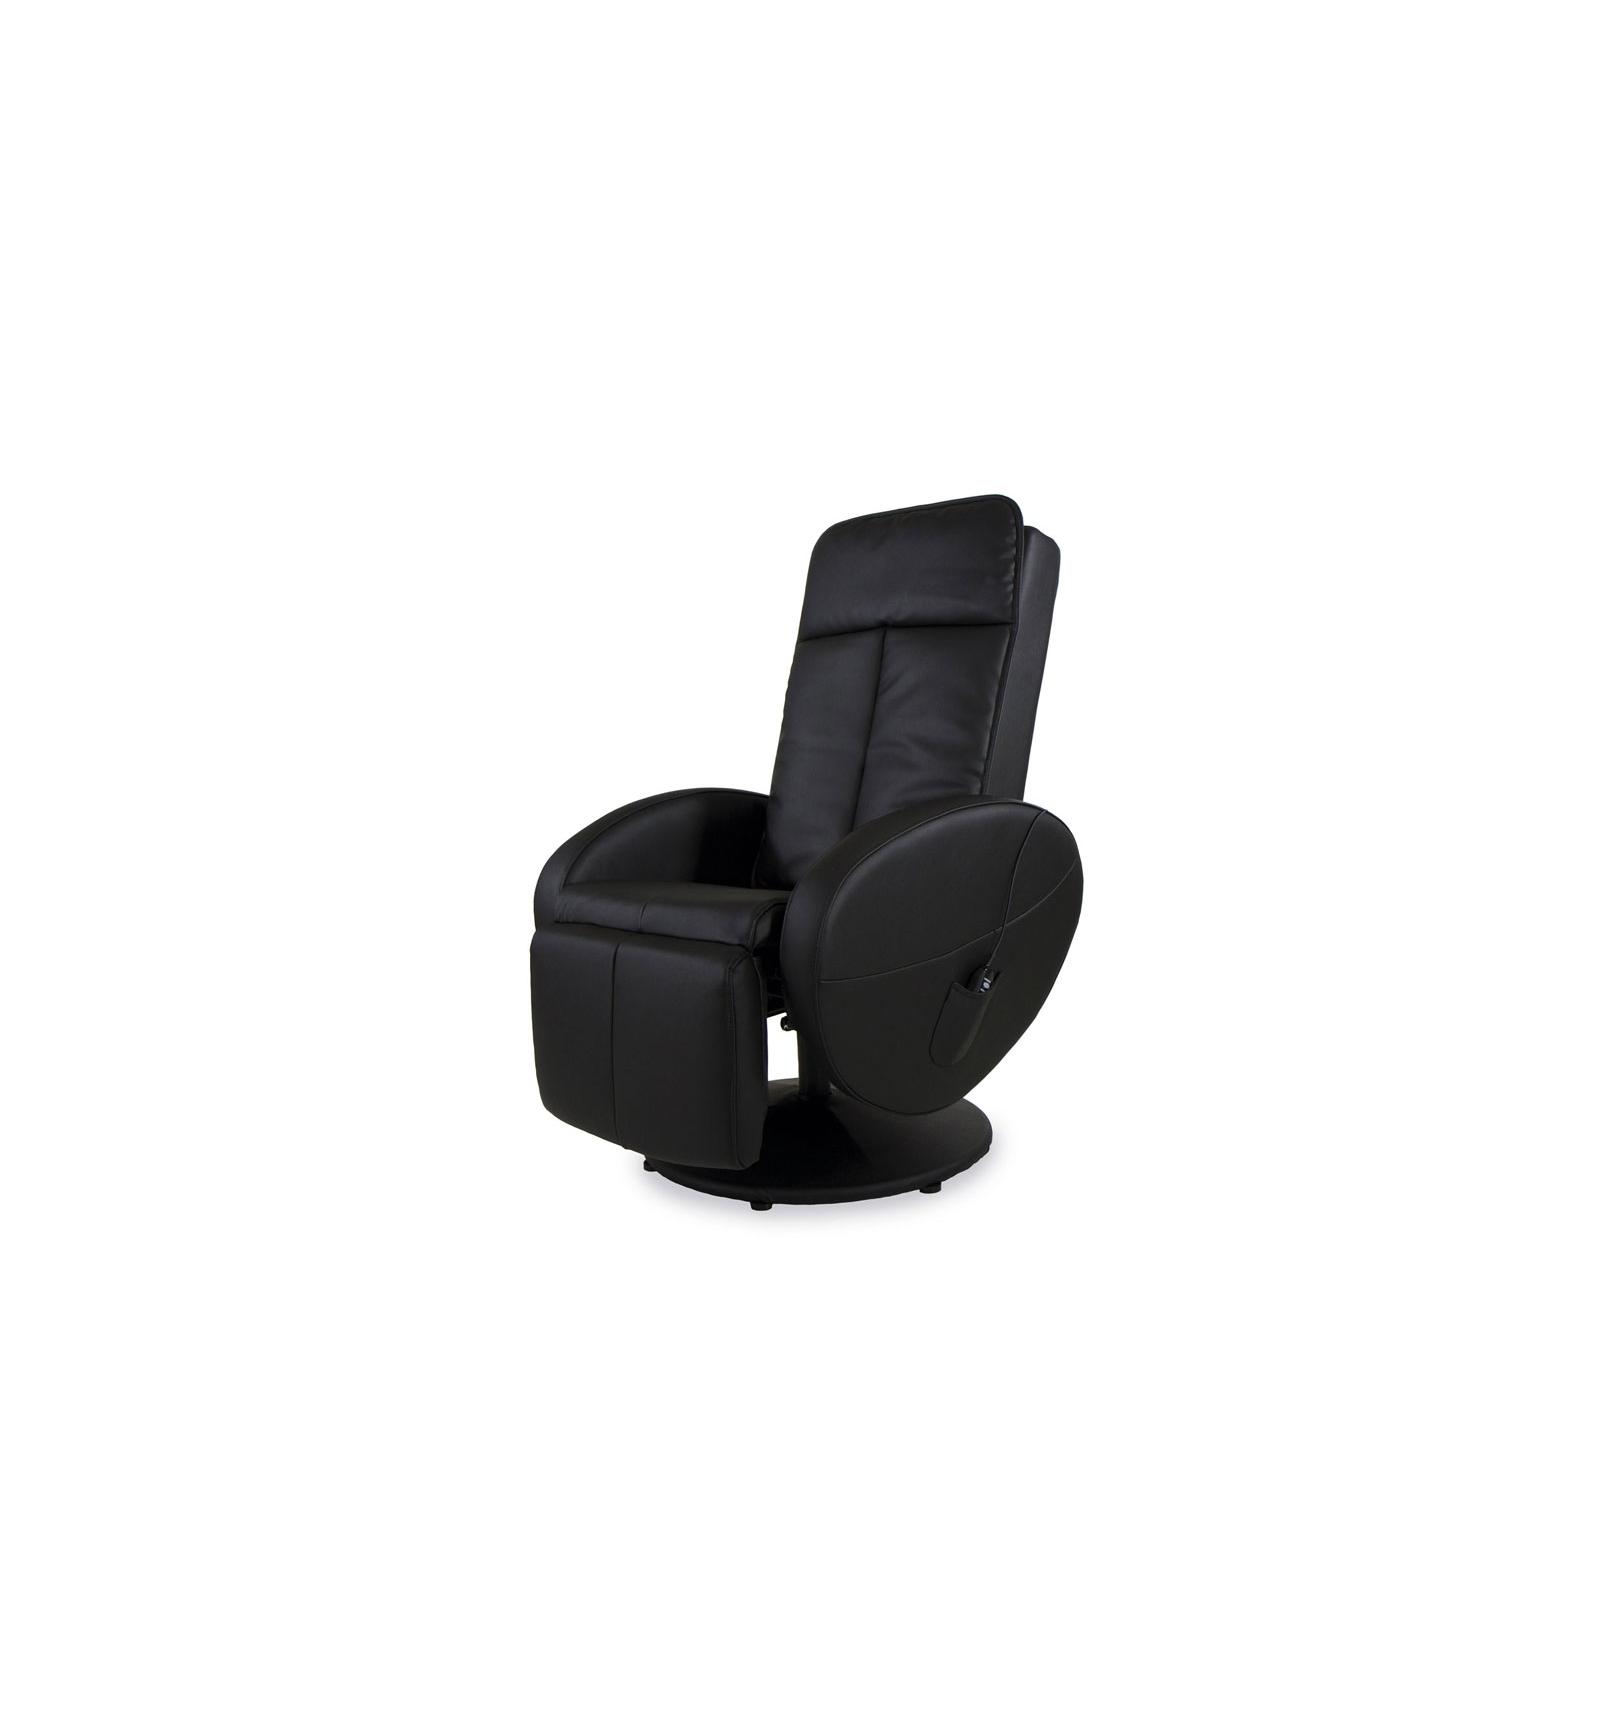 fauteuil de massage shiatsu. Black Bedroom Furniture Sets. Home Design Ideas